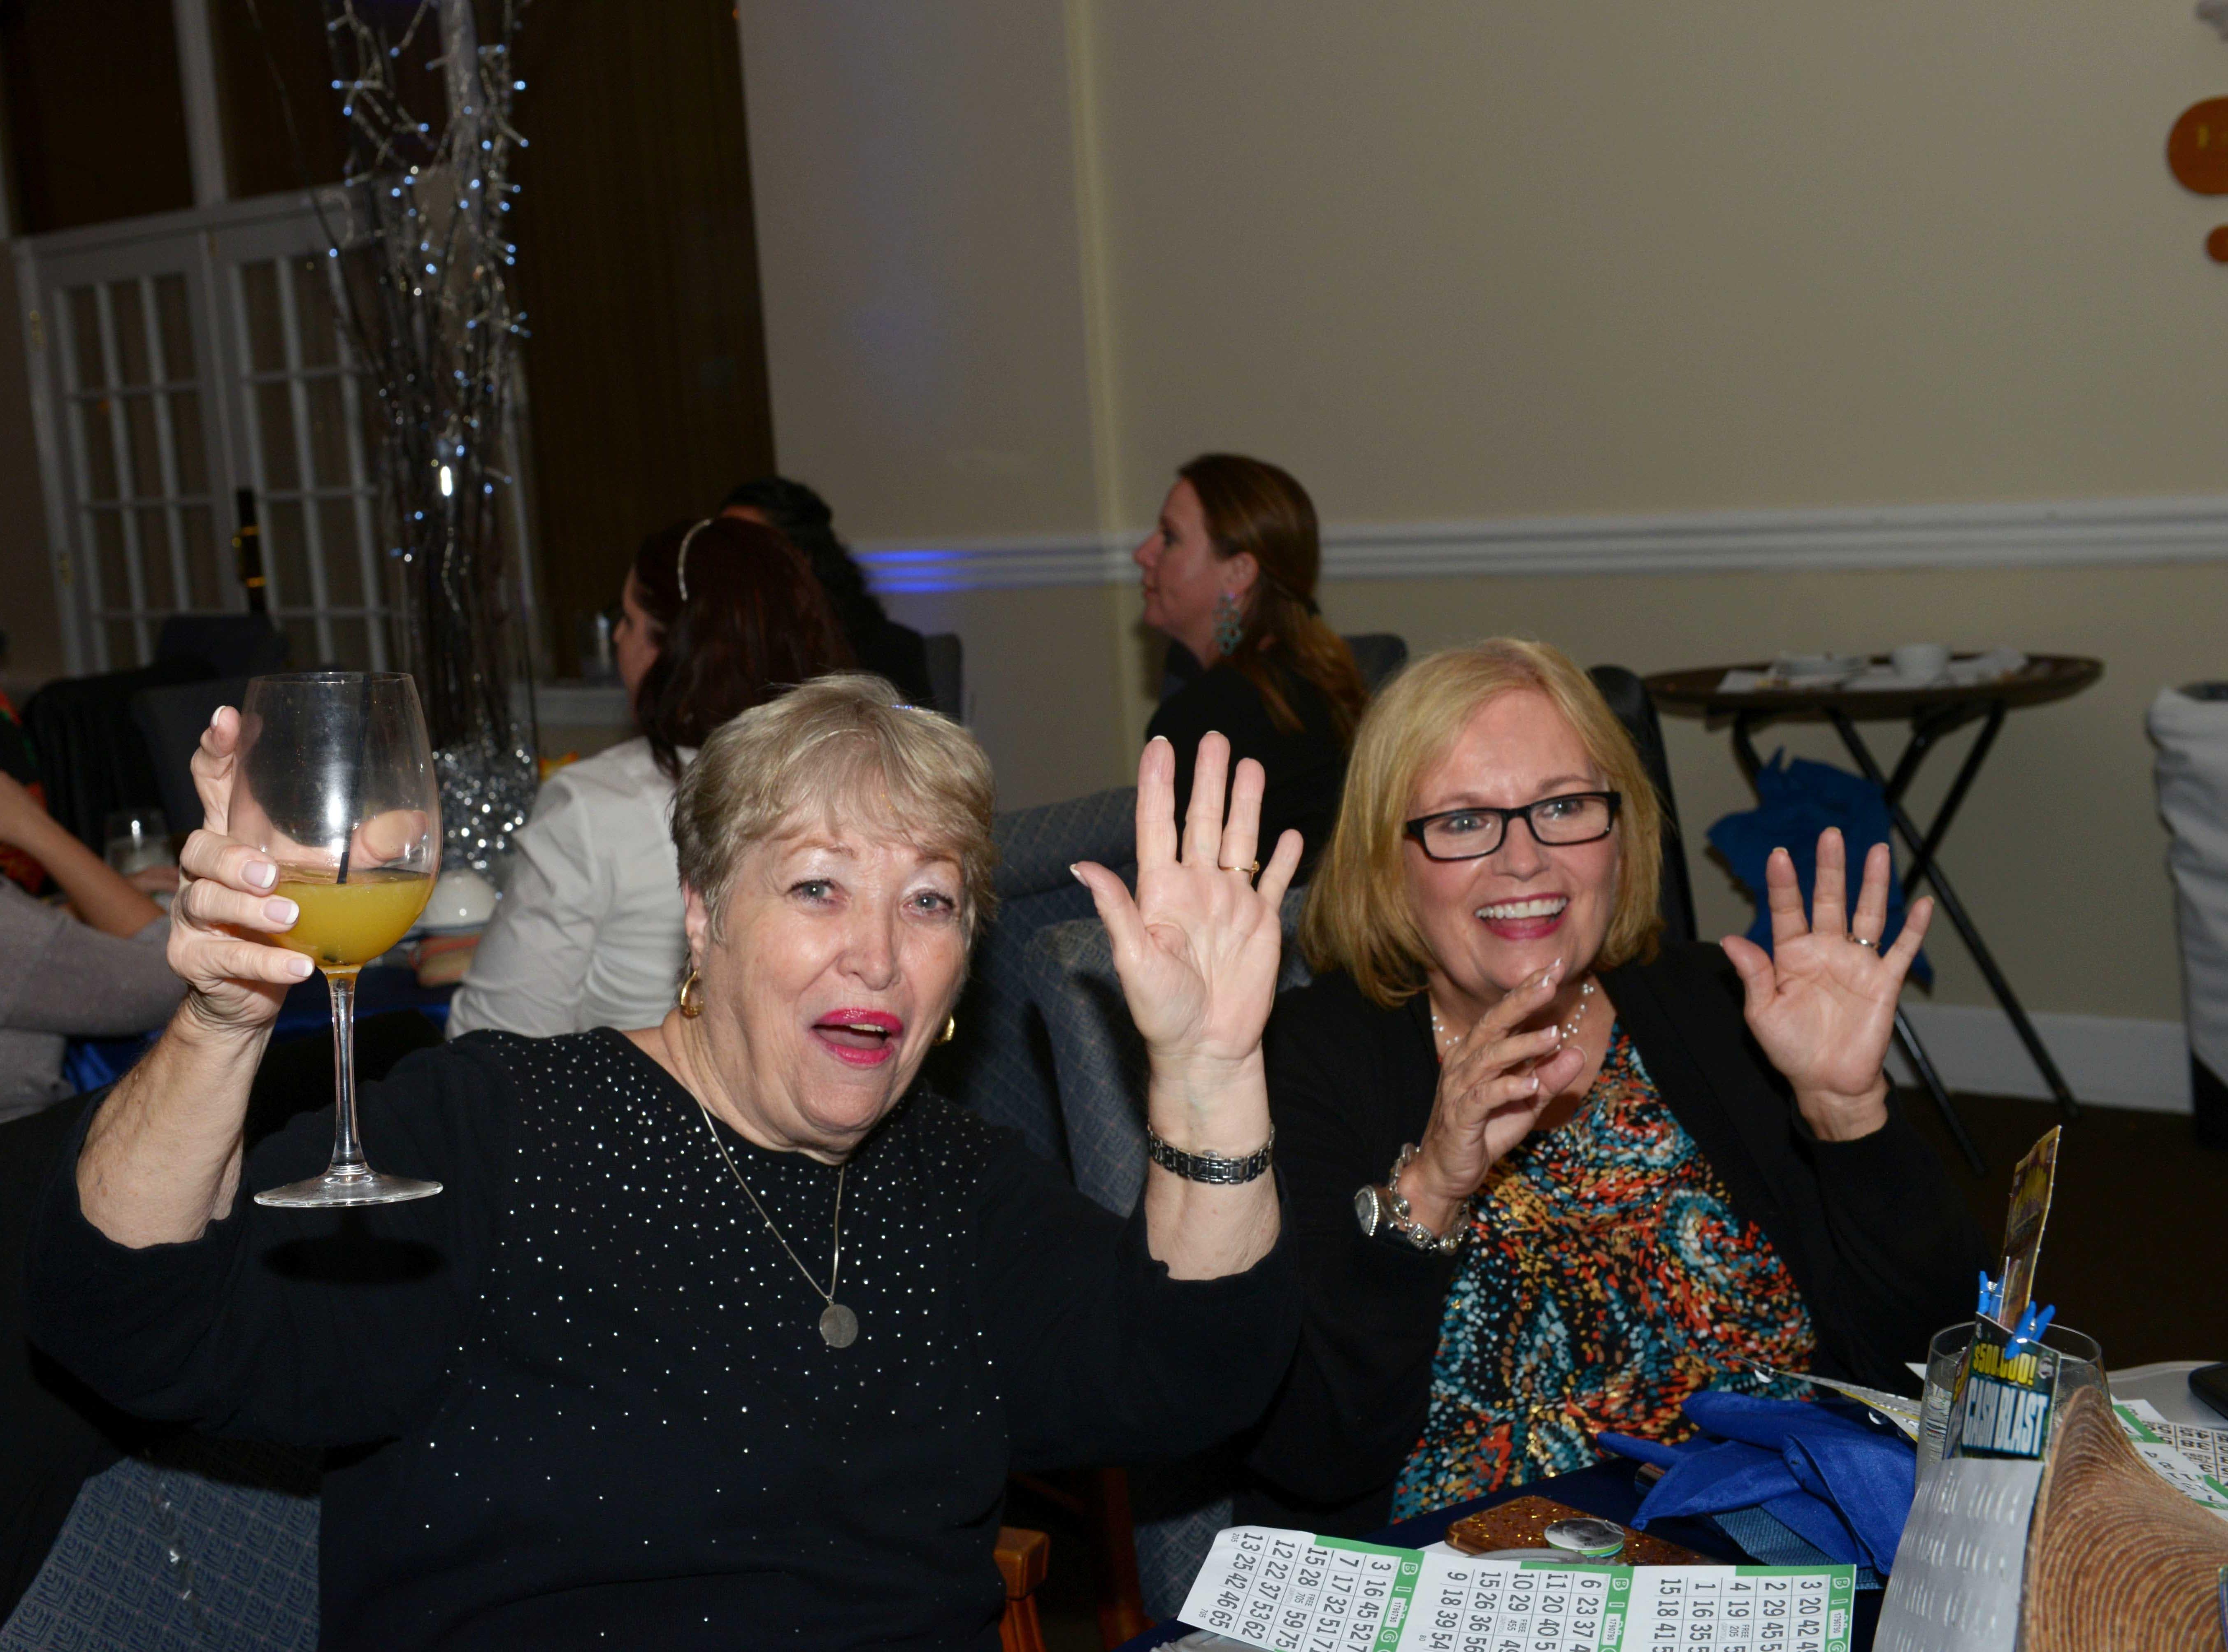 Tena Sigmon, left, and Sheila Votino at Family Meals' Black Tie, Blue Jeans & Bingo fundraiser in Fort Pierce.